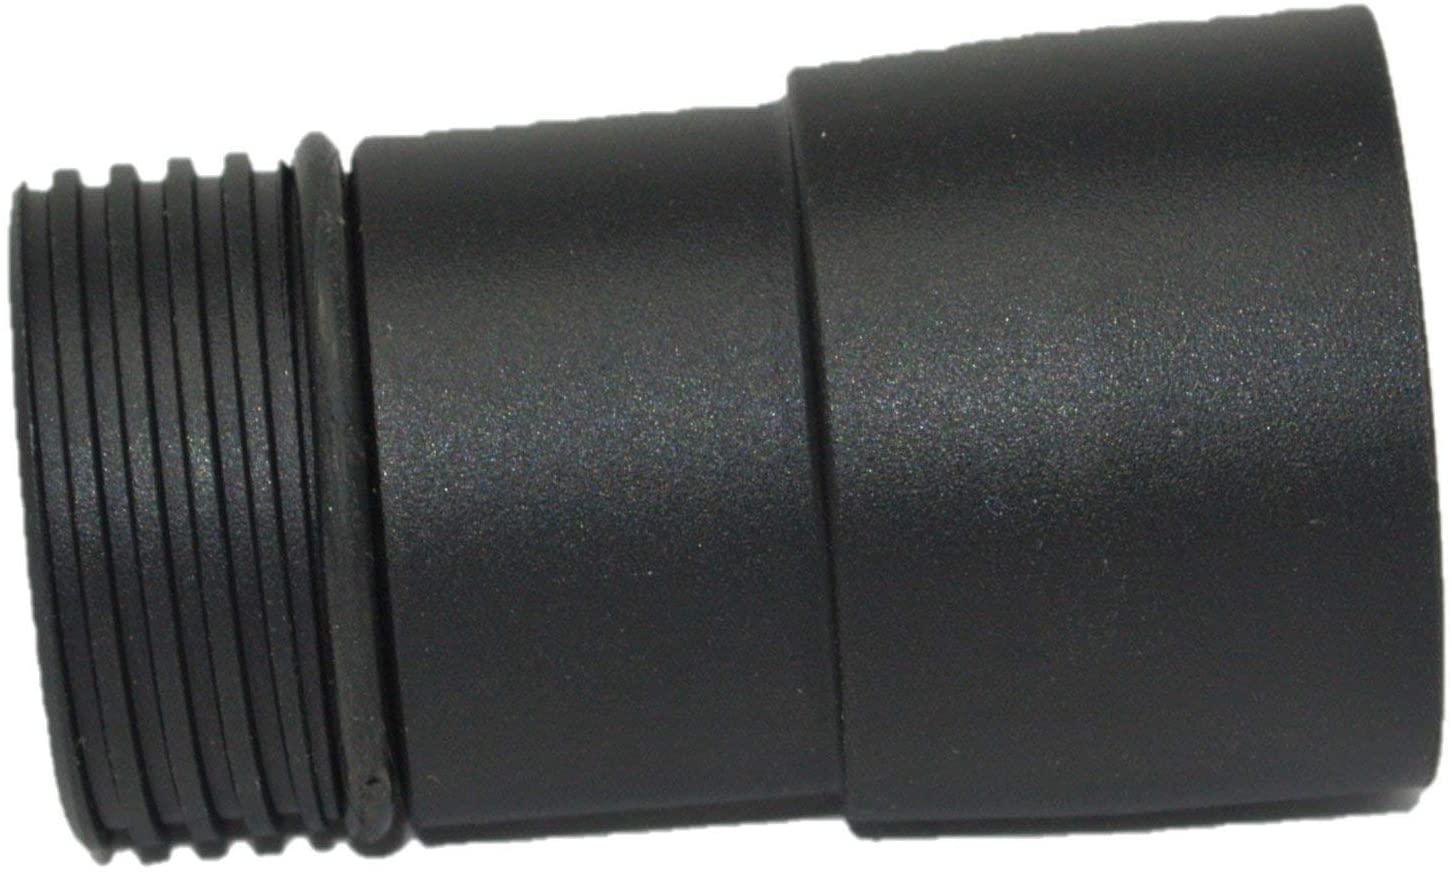 Super Stanchy Customs SSC CCI Phantom to GOG Carbon Barrel Adapter